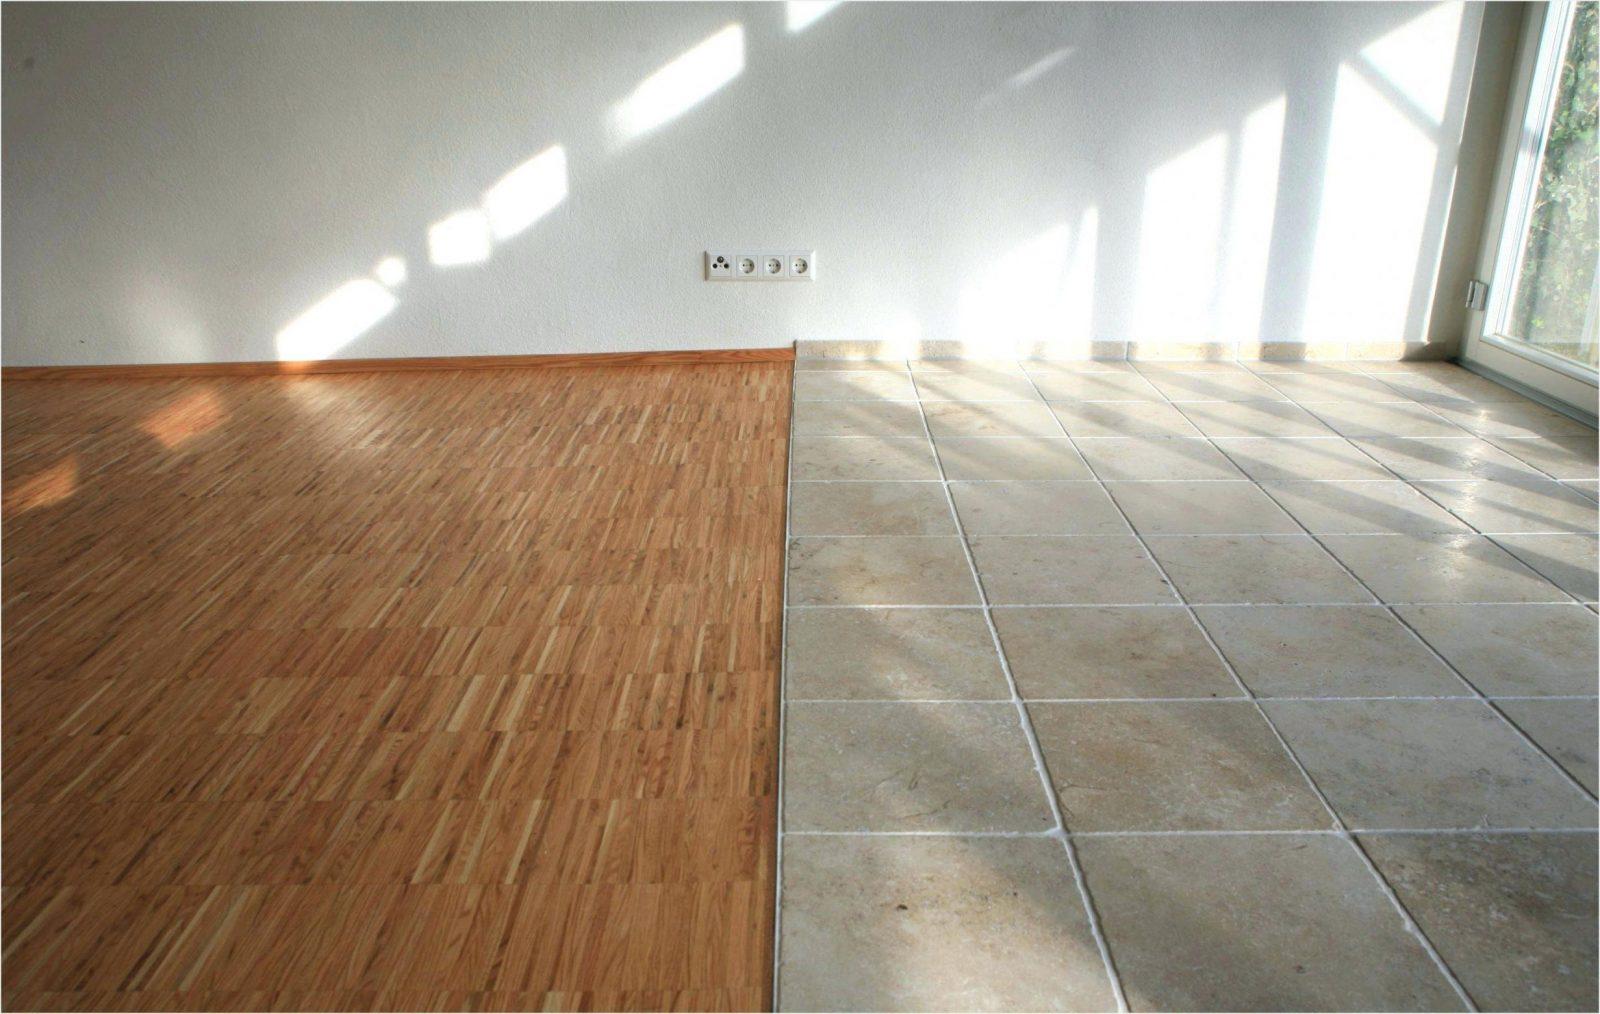 klick vinyl auf fliesen fabelhafte bad vinylboden im verlegen mm von klick vinyl auf fliesen. Black Bedroom Furniture Sets. Home Design Ideas